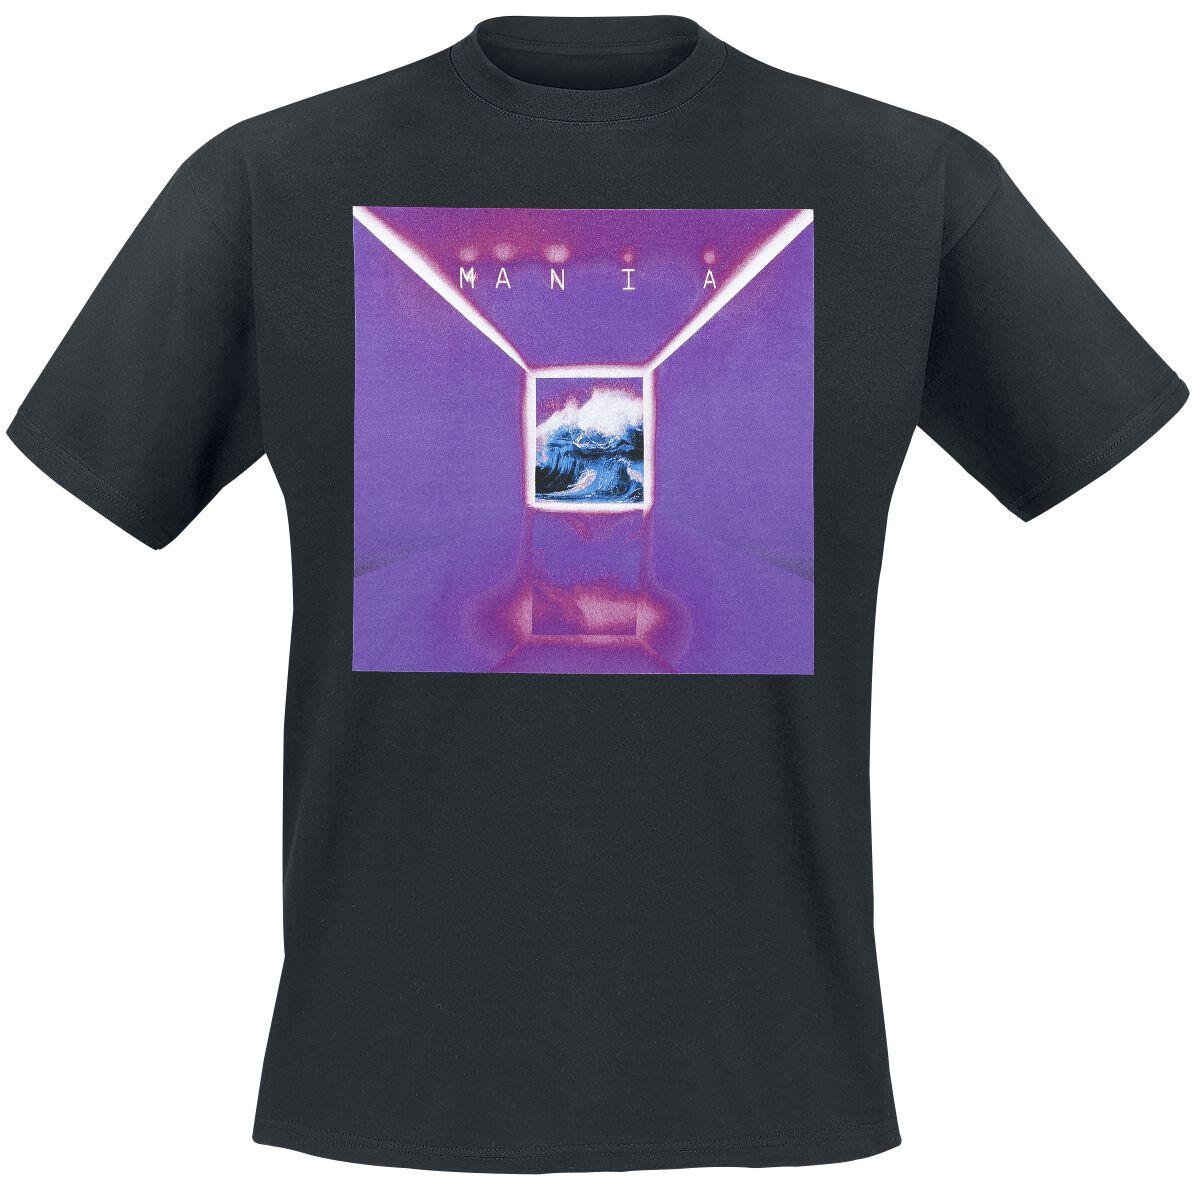 Zespoły - Koszulki - T-Shirt Fall Out Boy Mania T-Shirt czarny - 369815